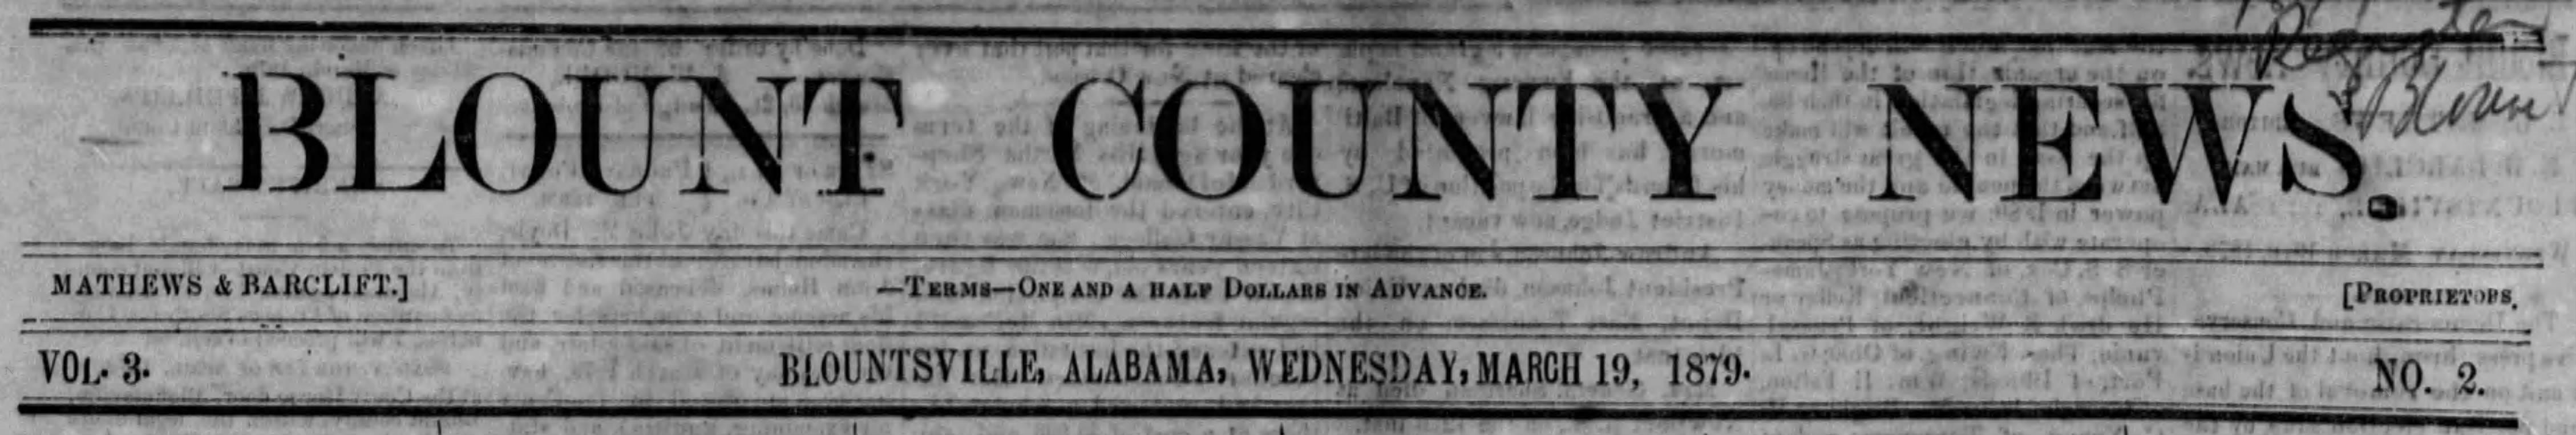 PATRON - March 19, 1879 - Sheriff announces sale of property